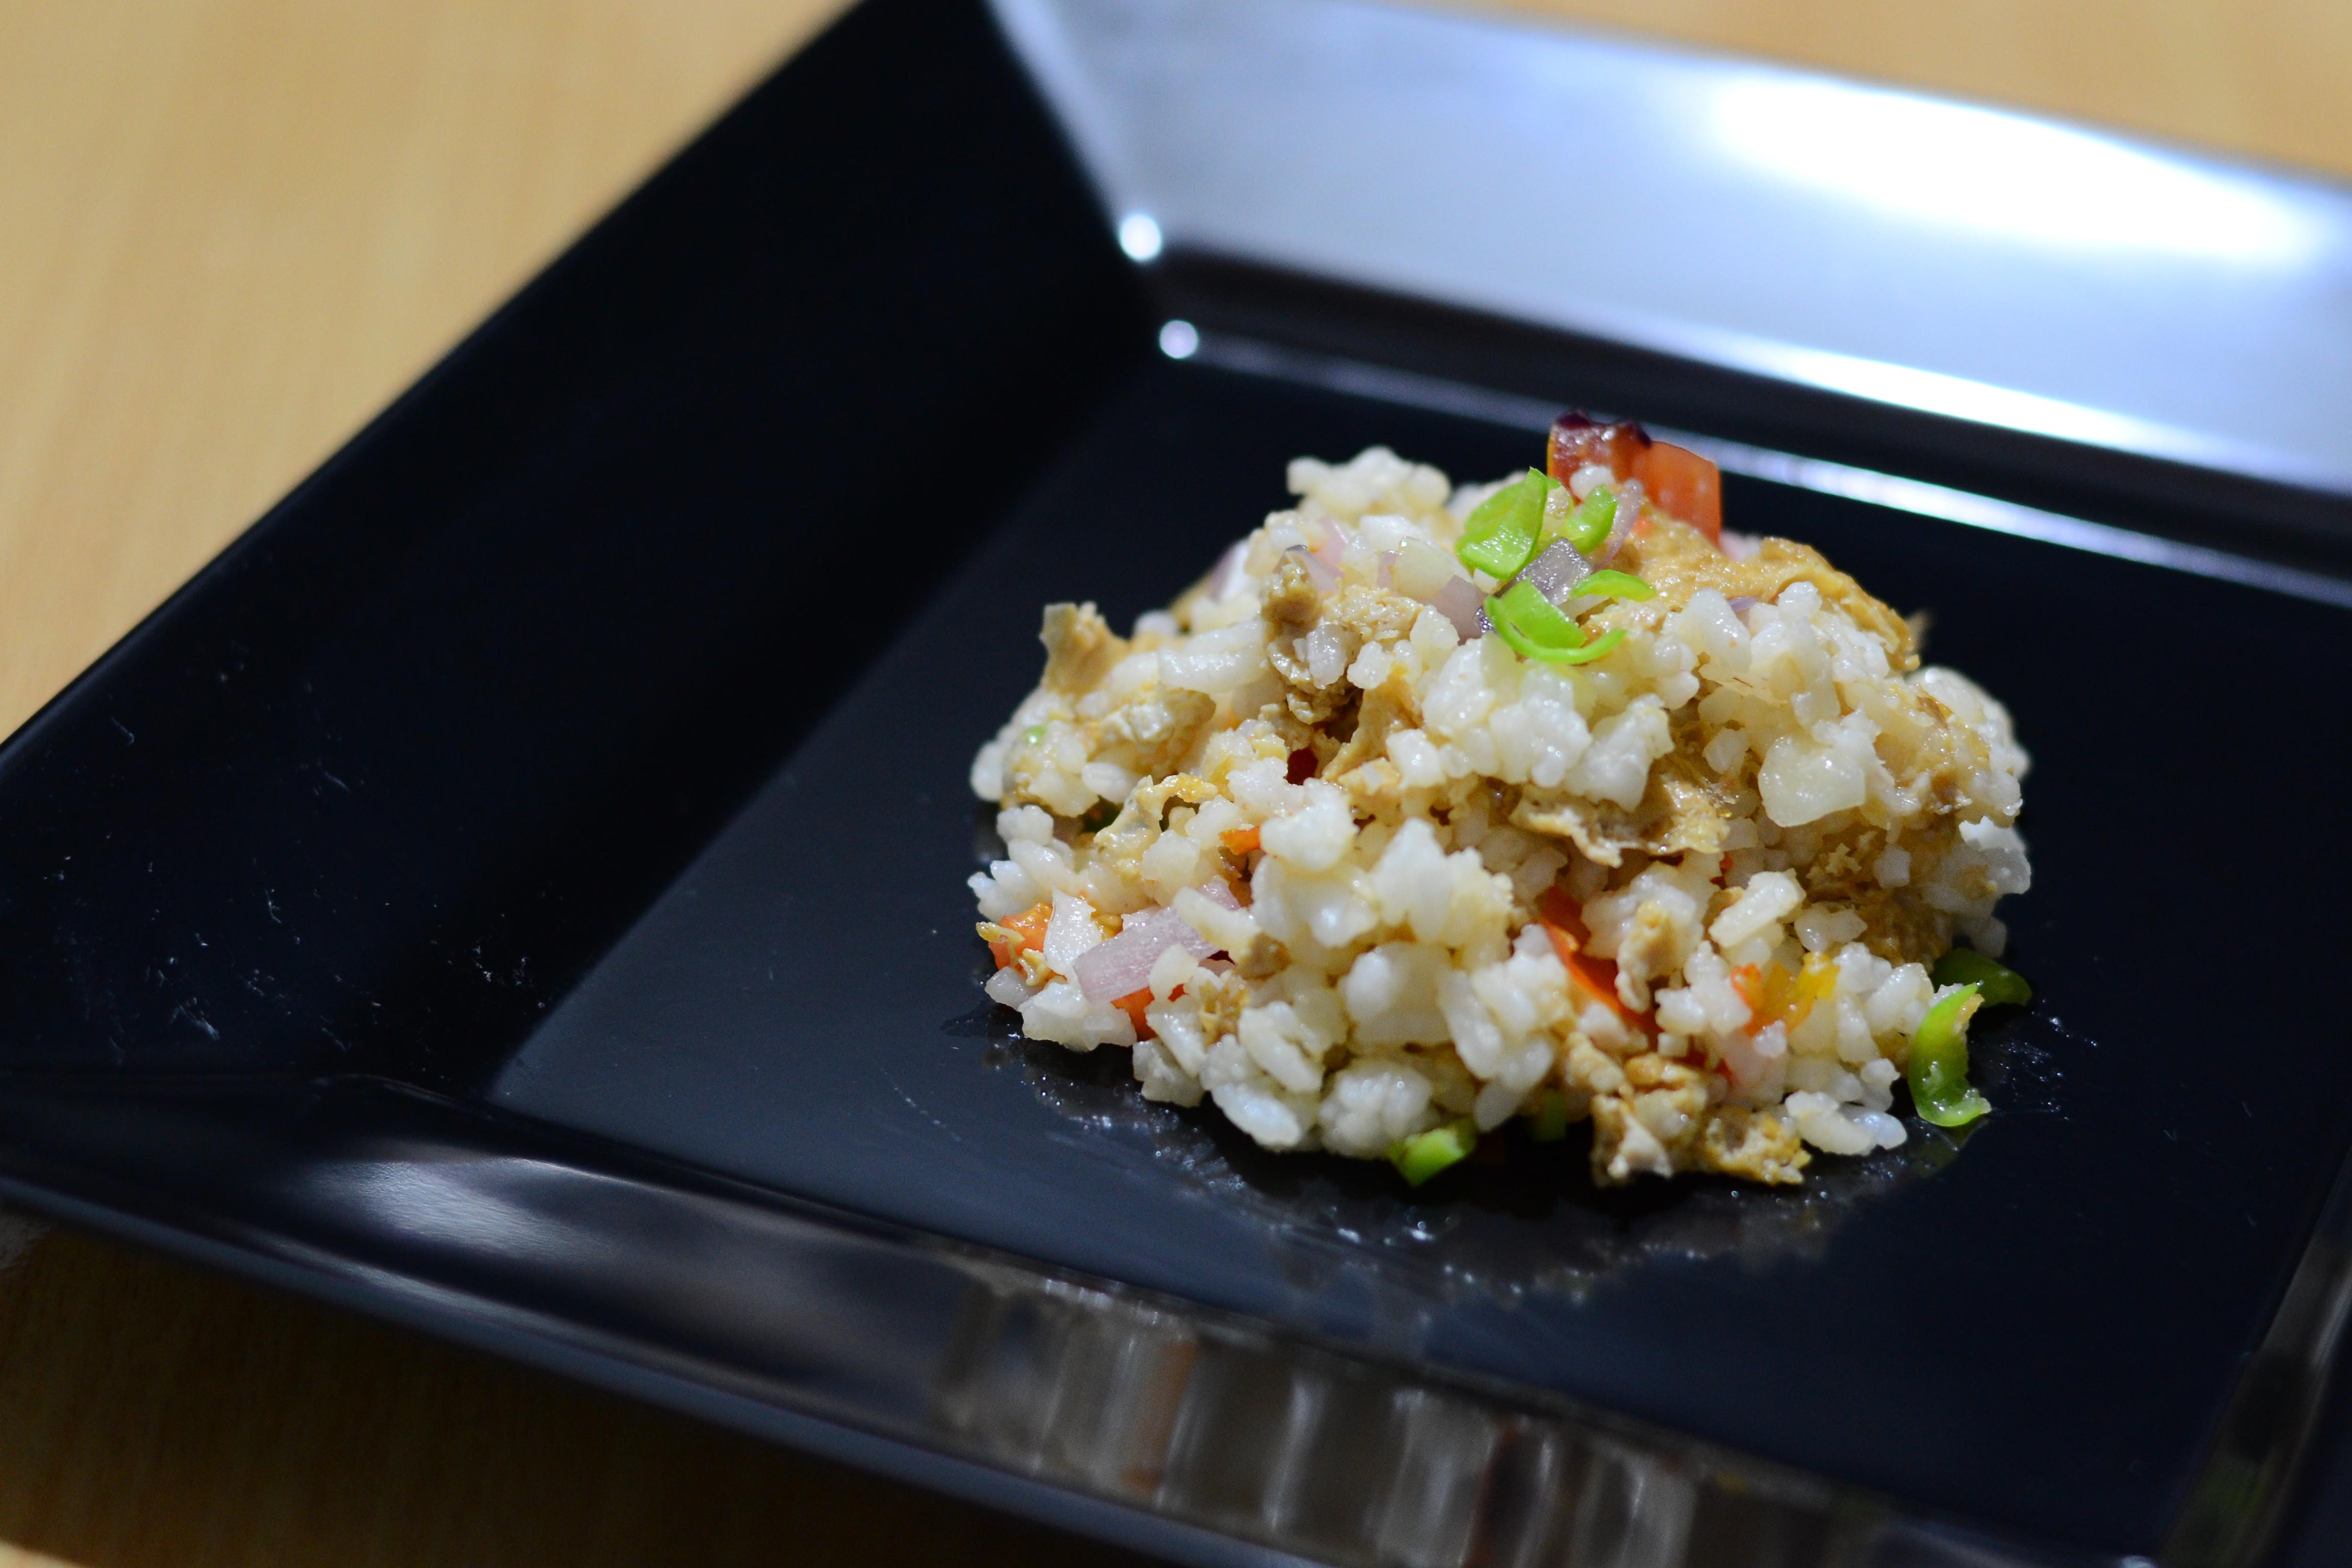 Making Fried Rice  4 Ways to Make Fried Rice wikiHow